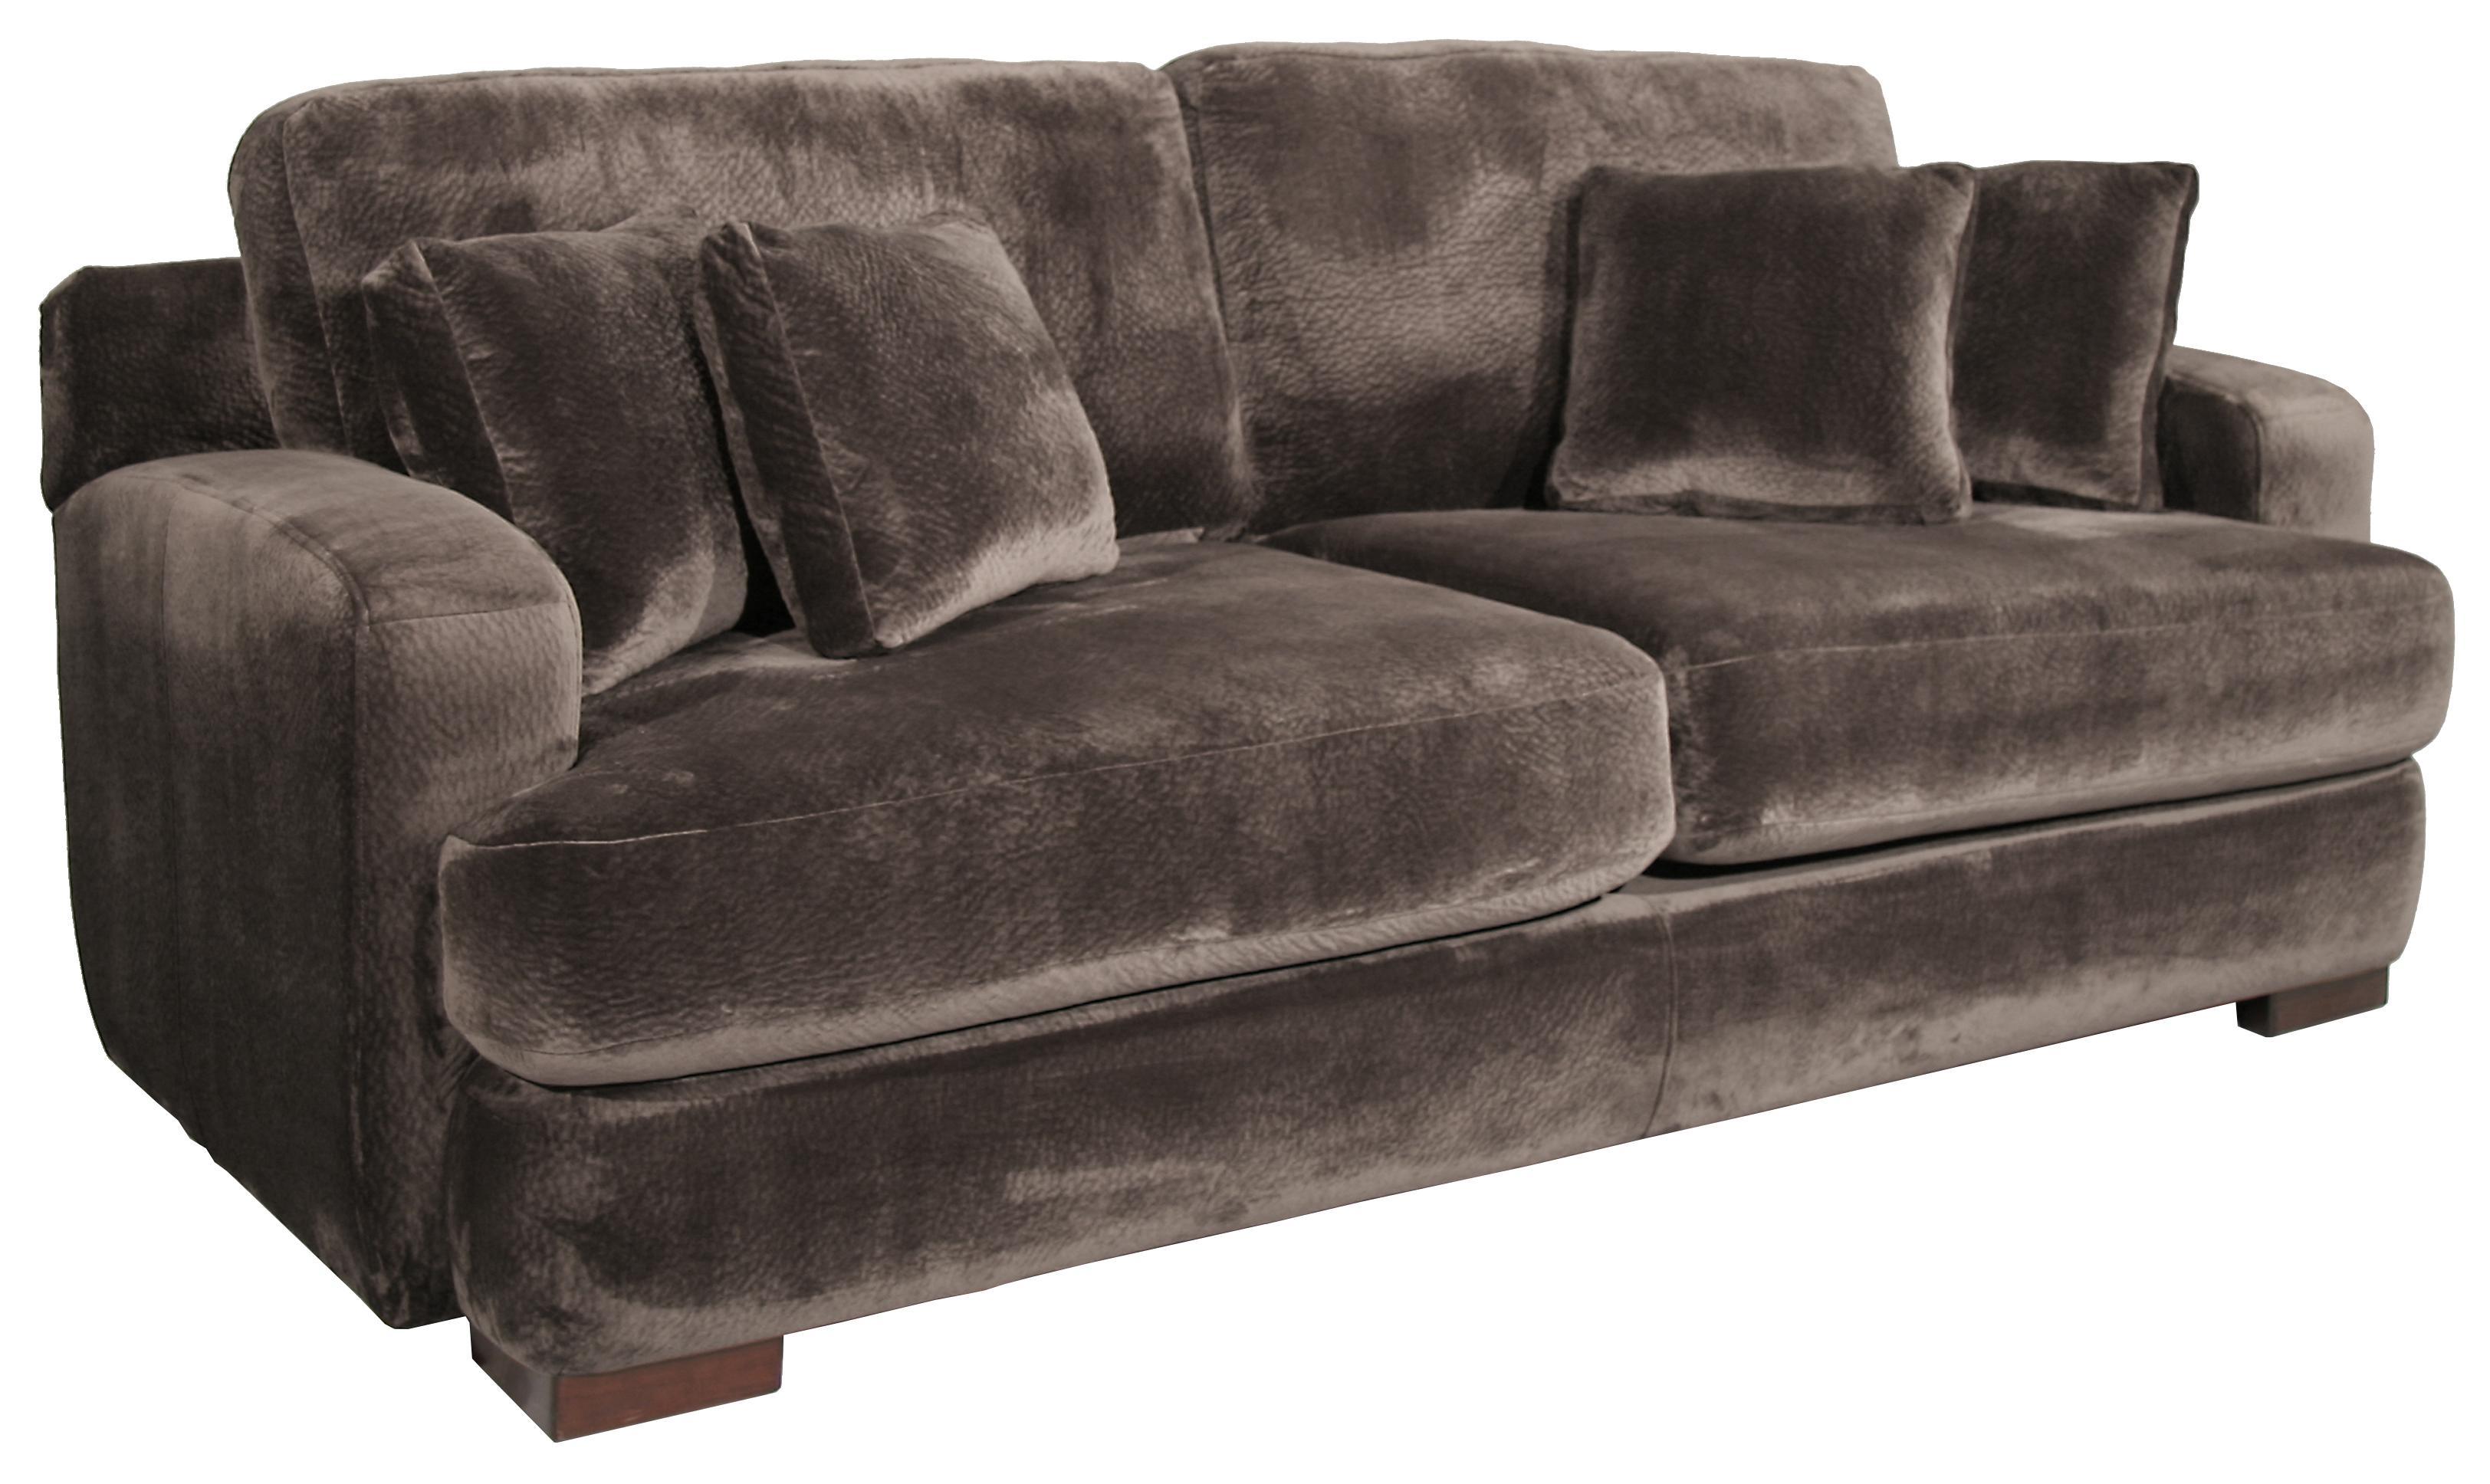 Fairmont Designs Riviera 668 Comfortable Sofa Sleeper With